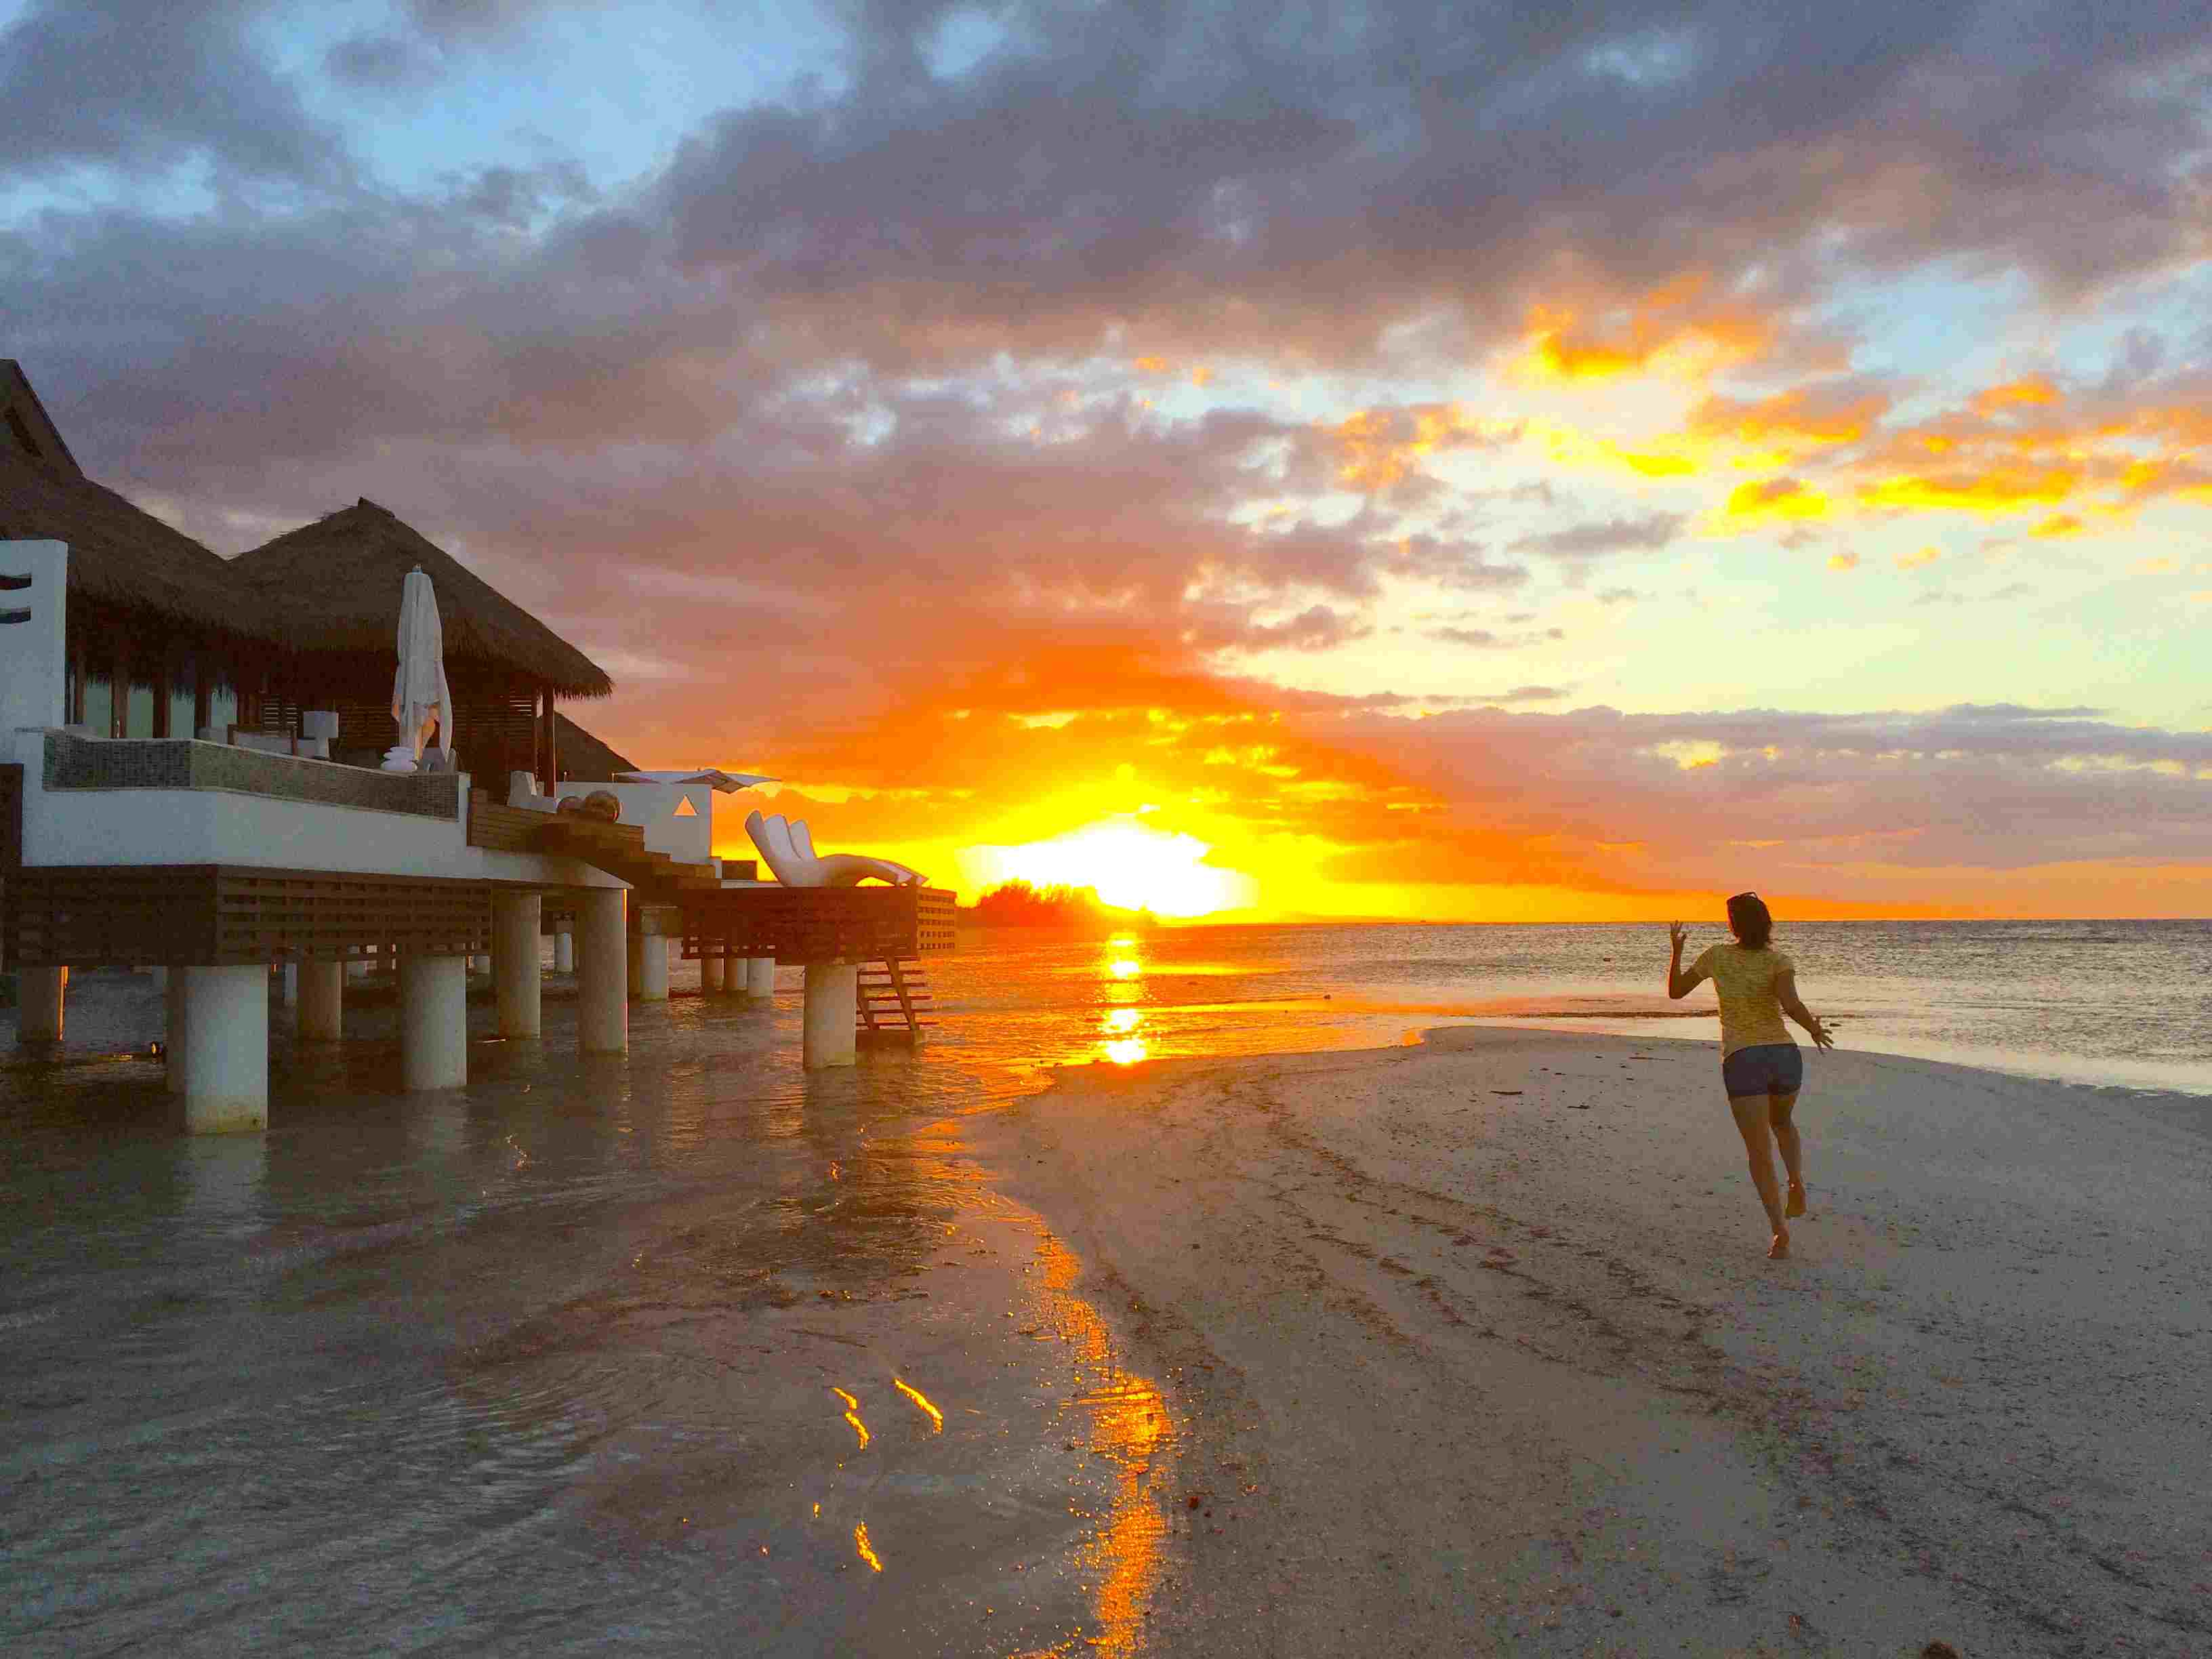 Sunset at Sandals overwater villas